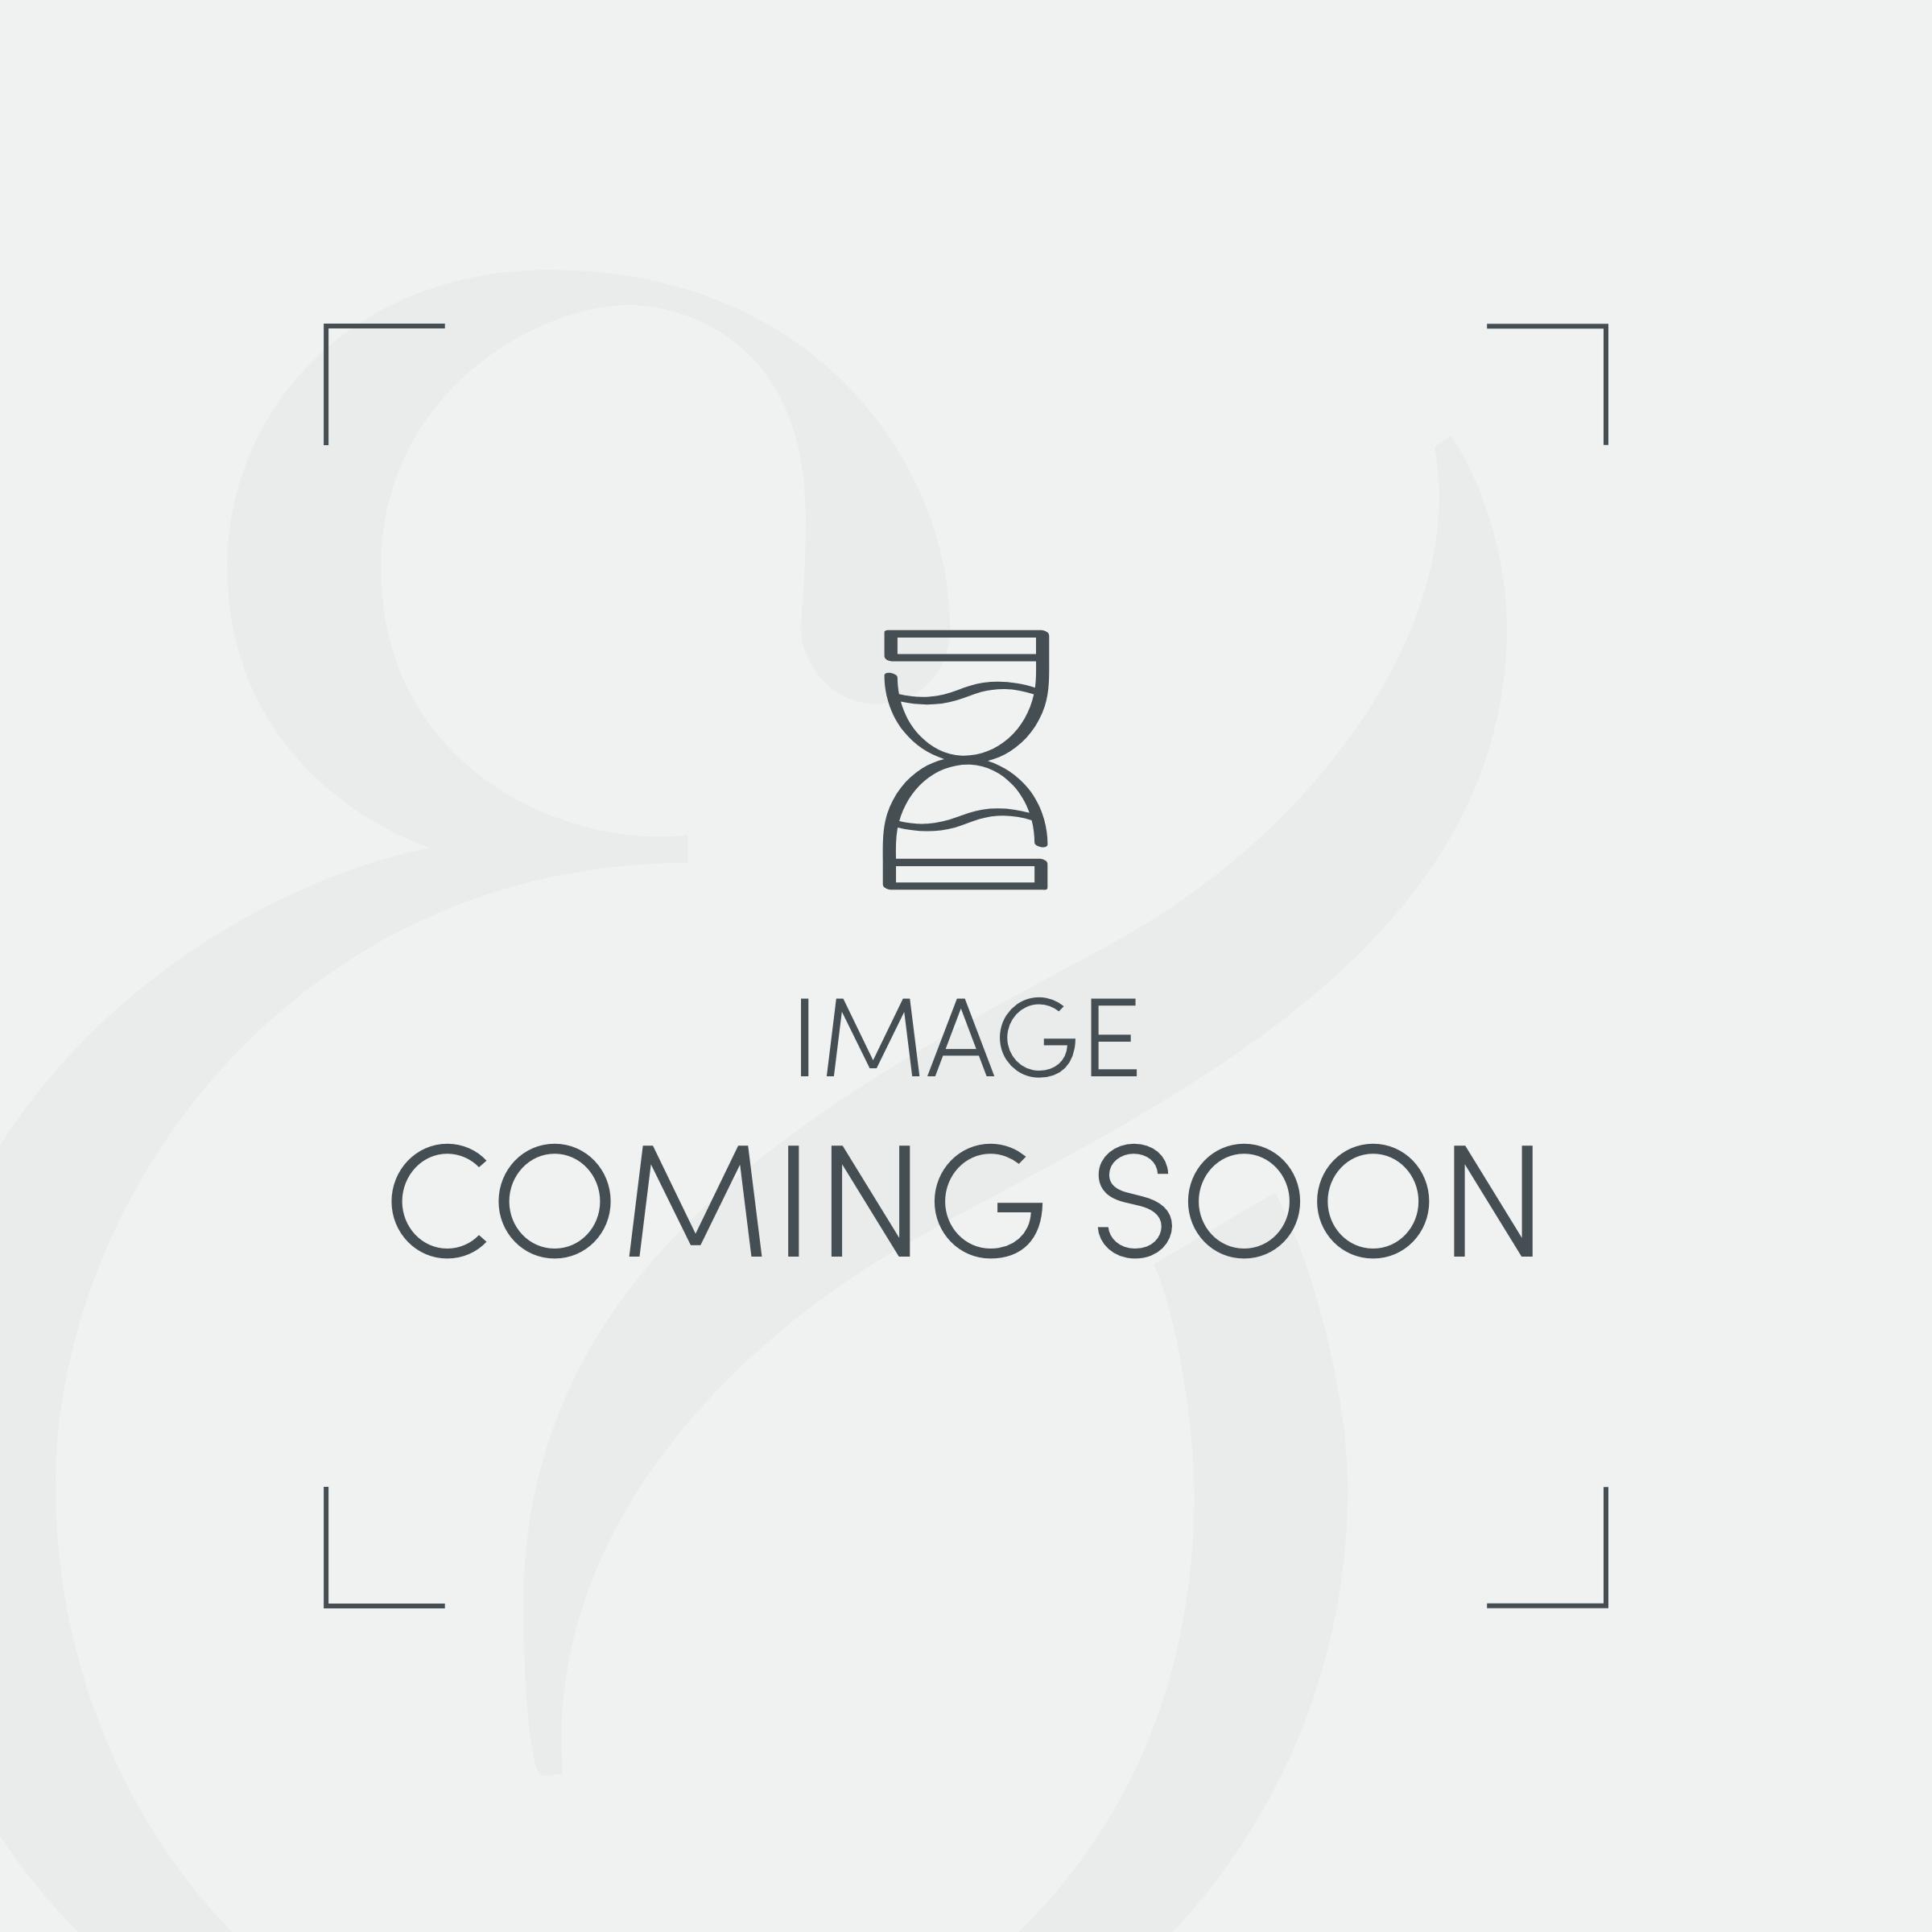 Luxury 100% Egyptian Cotton Large Bath Towel - Smoke